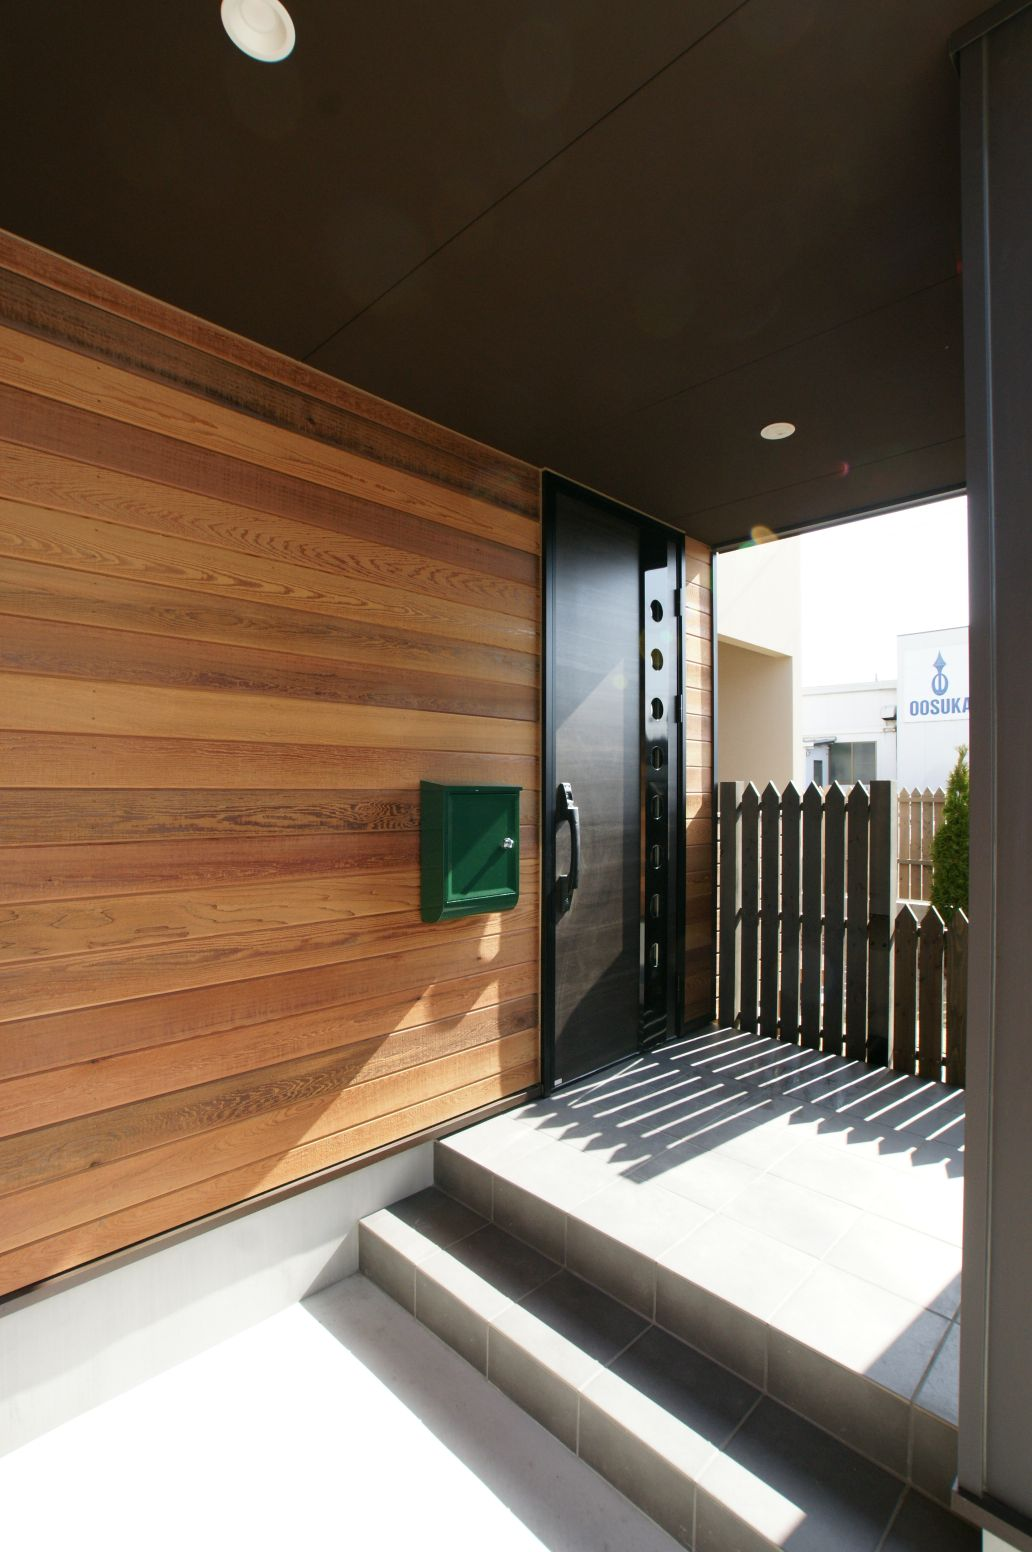 RIKYU (リキュー)【デザイン住宅、省エネ、インテリア】木目が印象的な玄関ホール